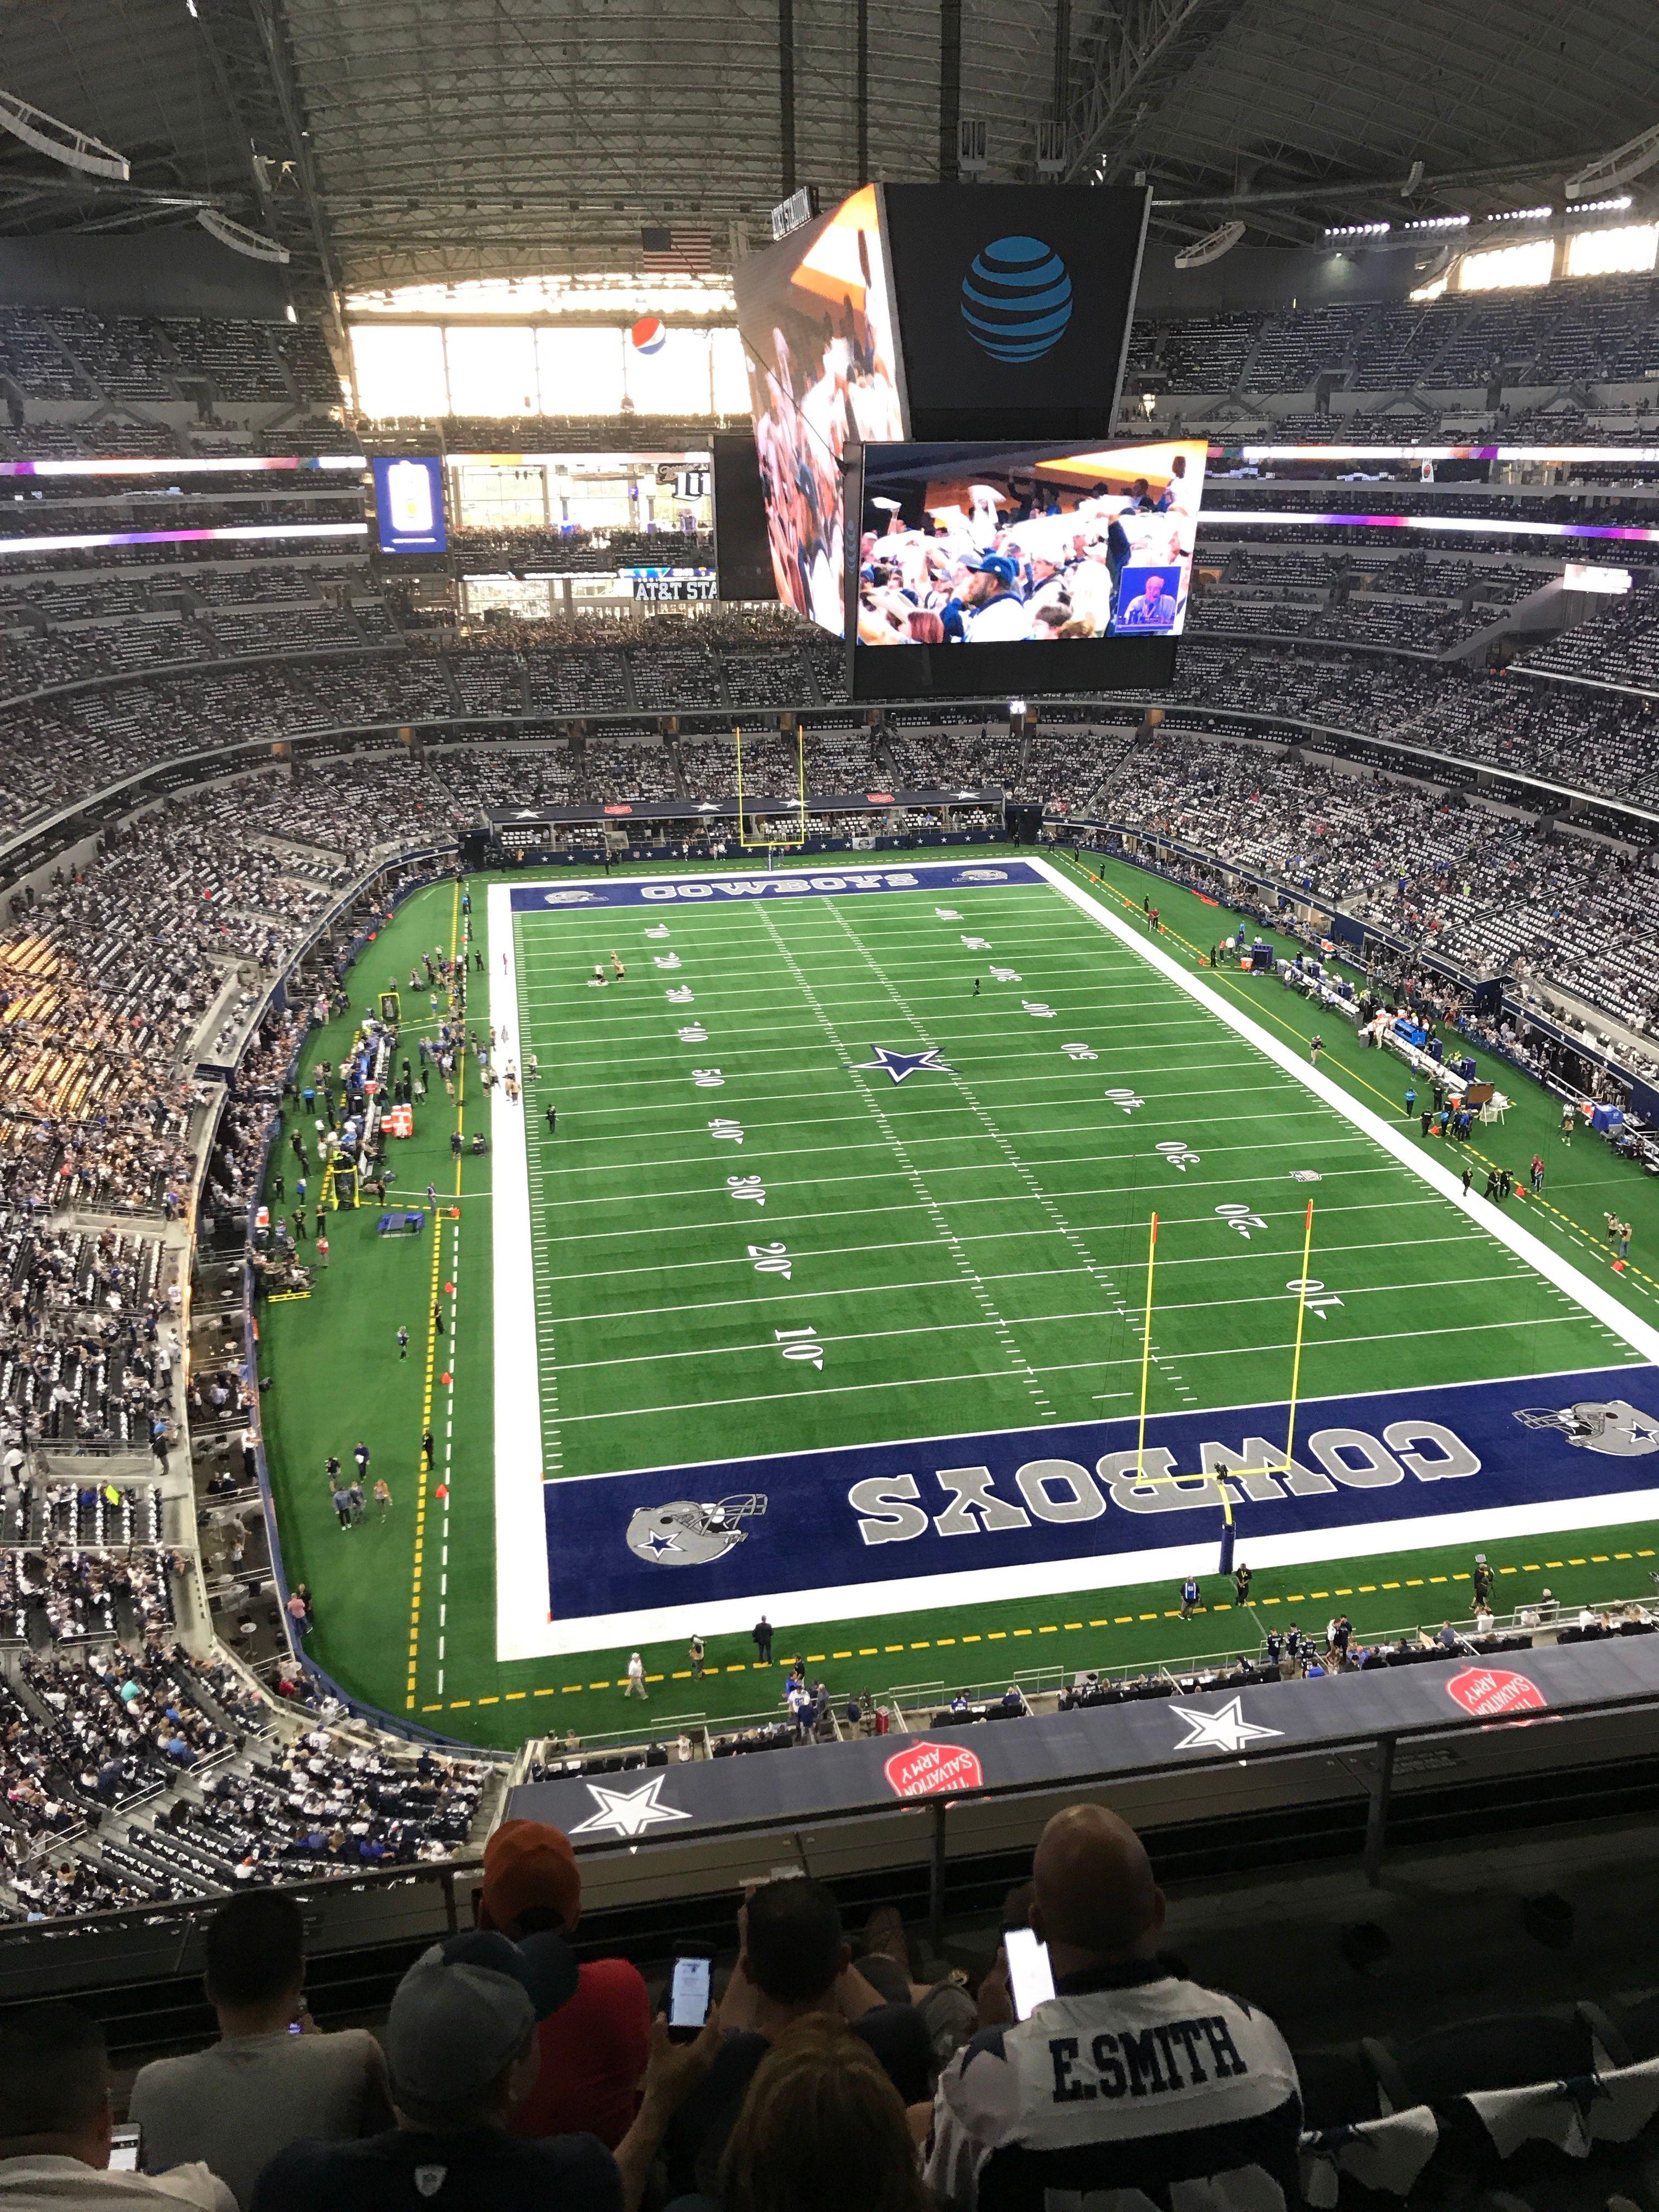 The Original Dallas Cowboys' NYC Hardcore Fan Club